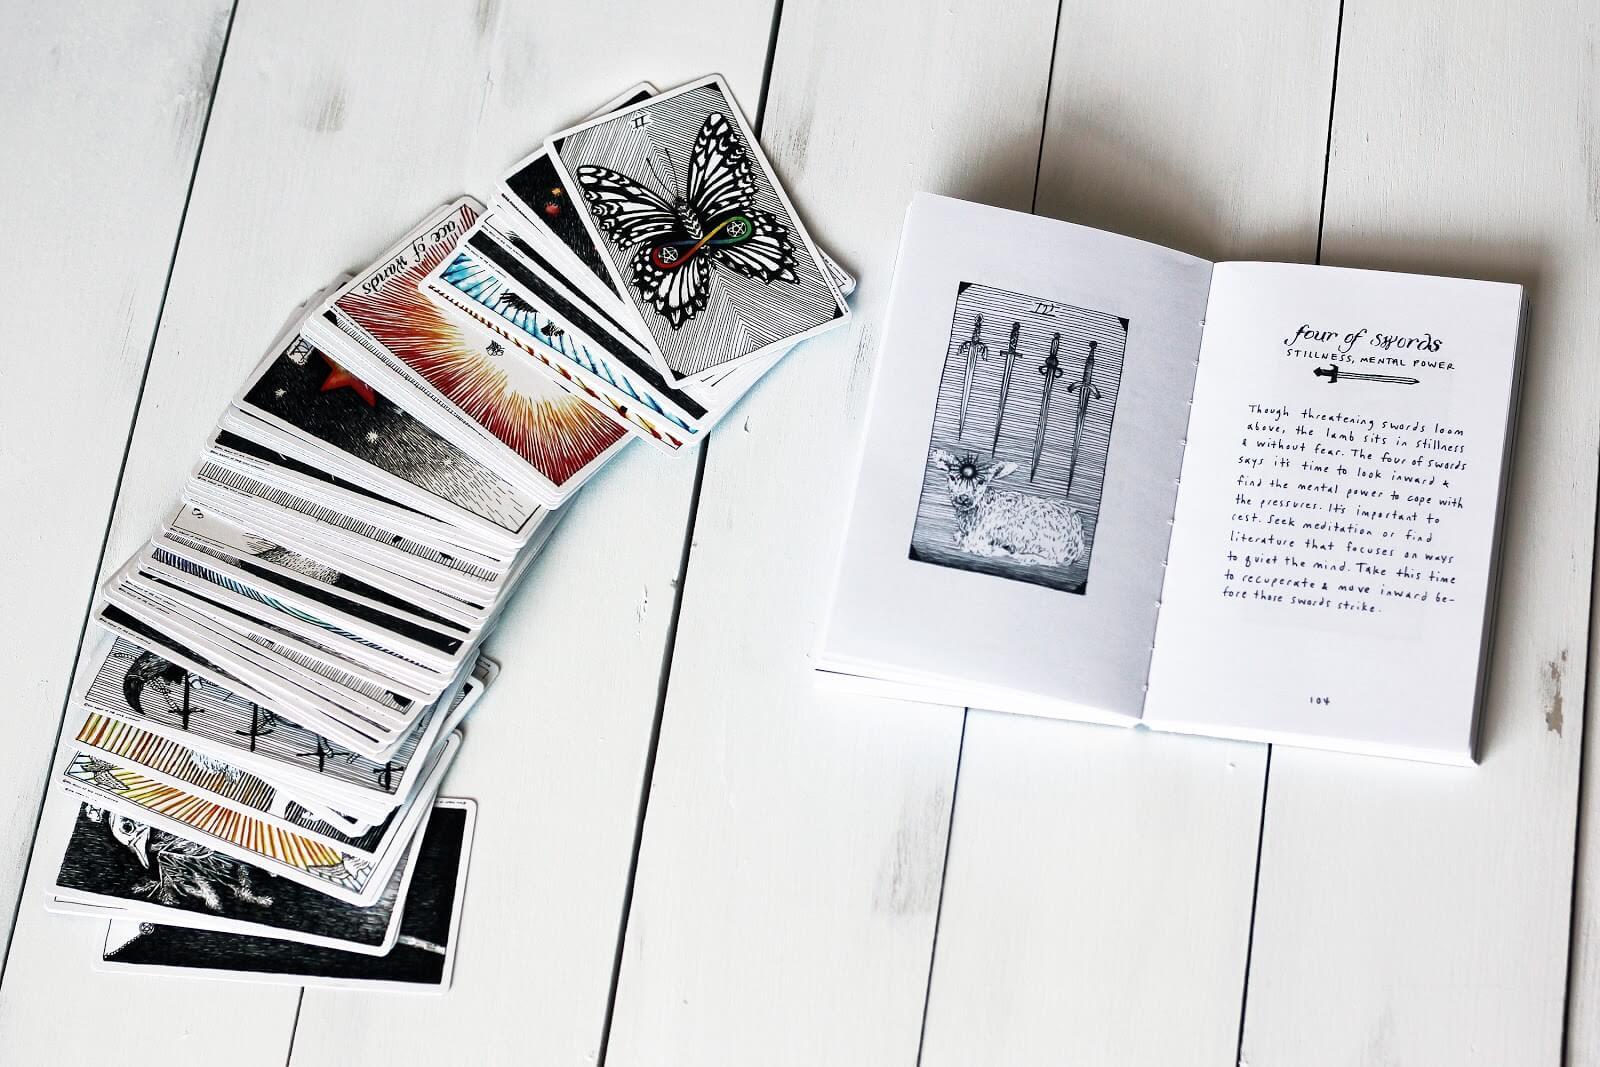 How To Read Tarot Cards For Beginners | Biddytarot Blog - Printable Tarot Cards Pdf Free